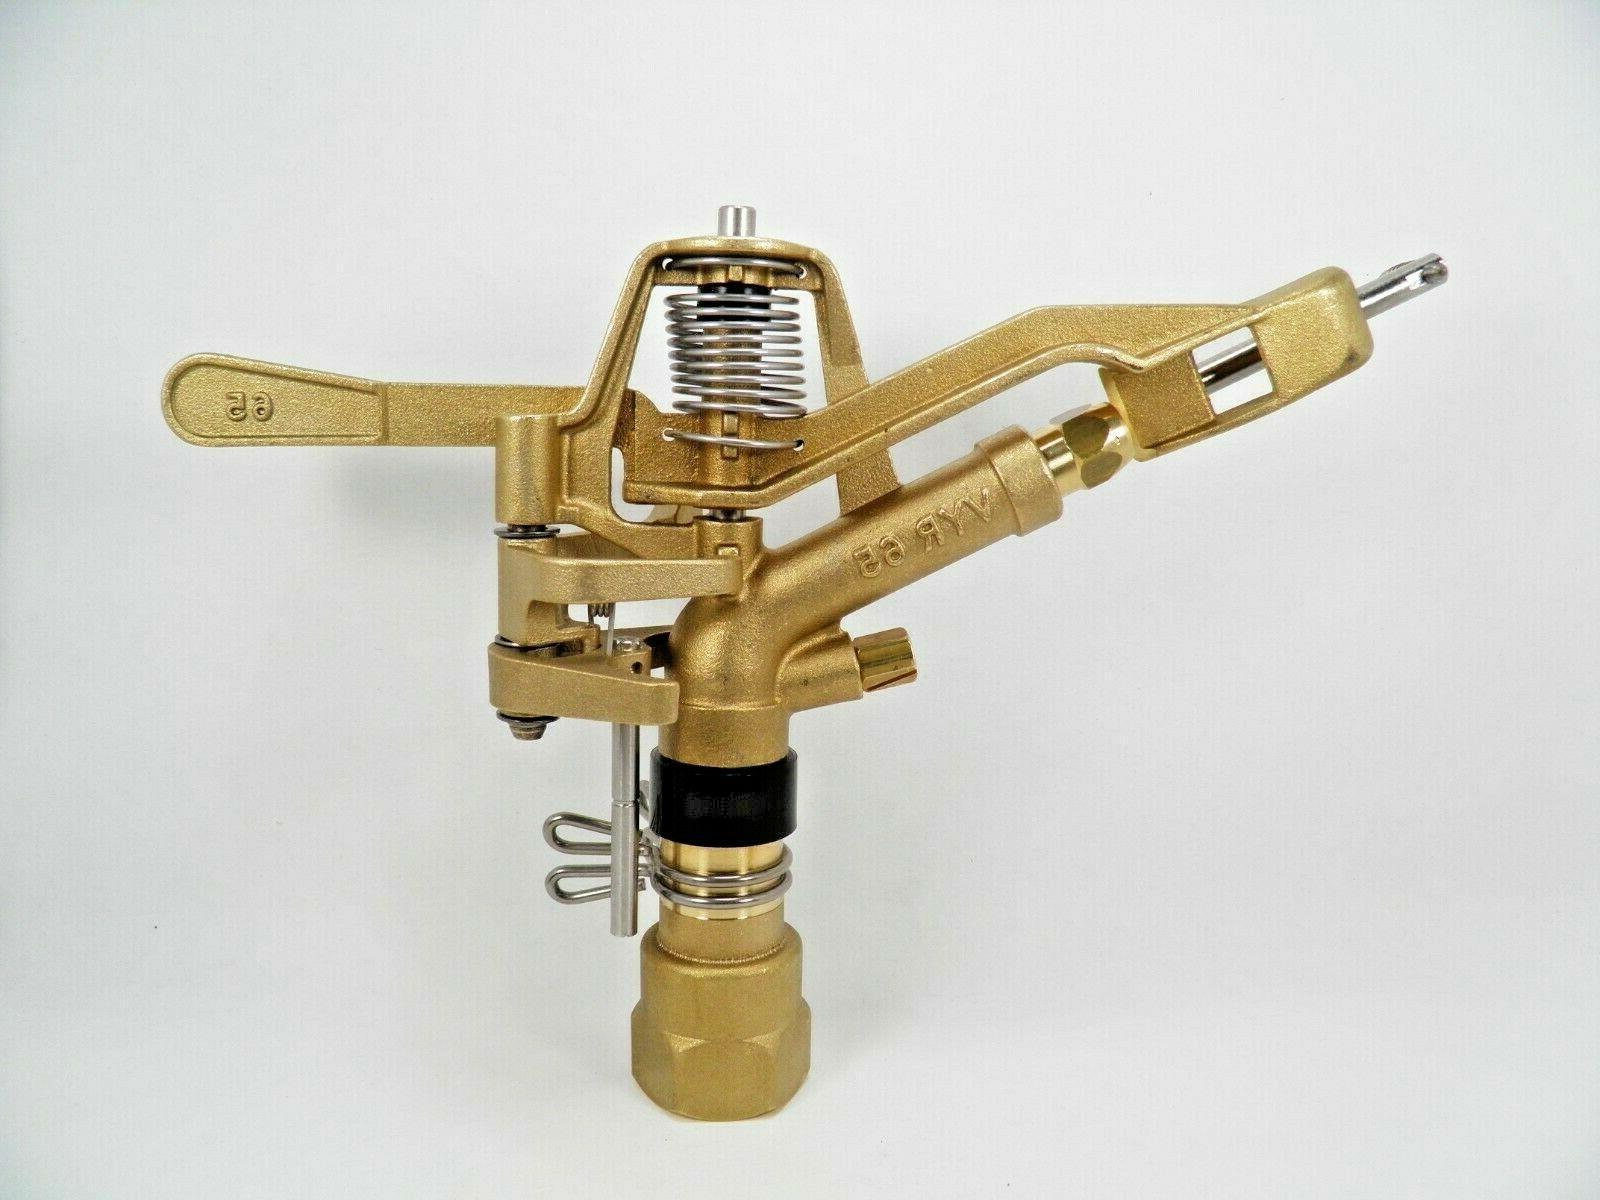 VYR-65 DBL DESIGN IMPACT SPRINKLER REPLACE BIRD 65